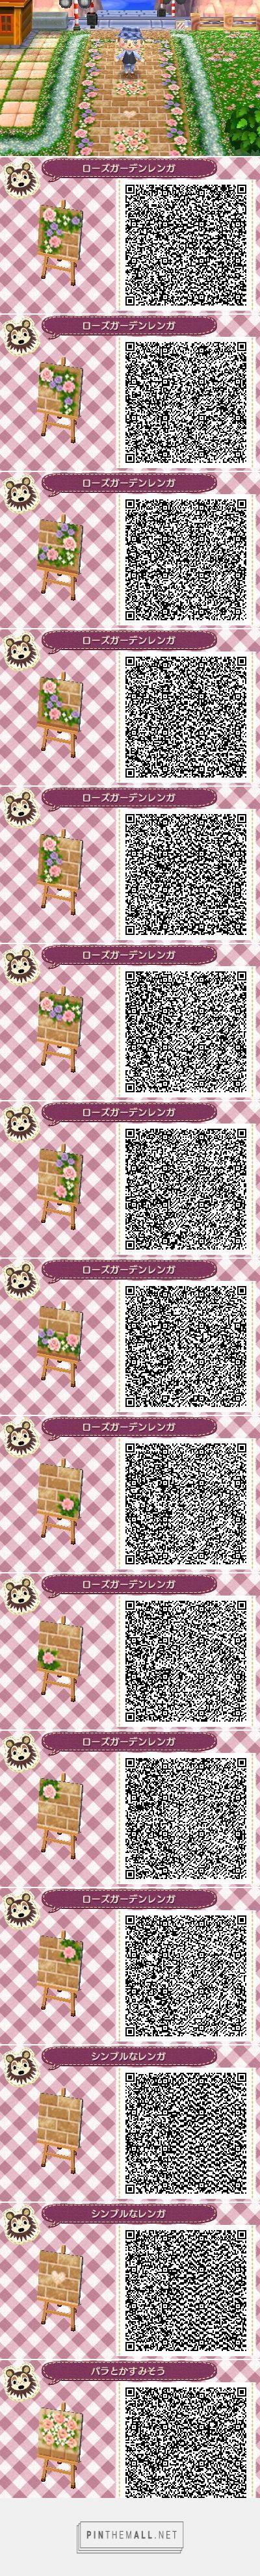 Animal Crossing New Leaf Qr Codes Pink Stone Path Click Through